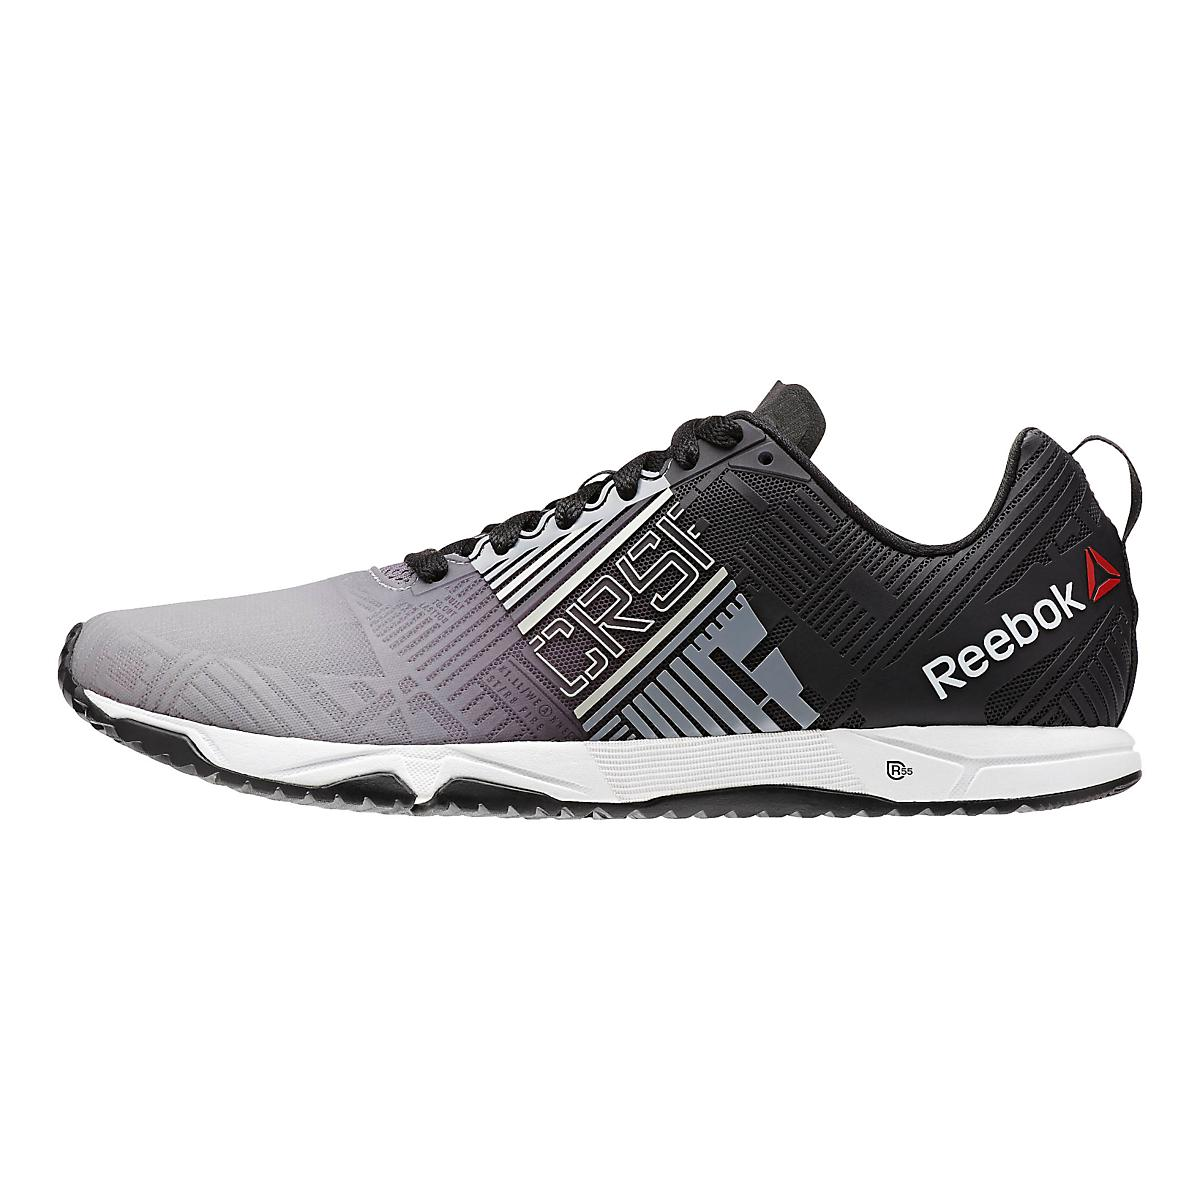 Men's Reebok�CrossFit Sprint 2.0